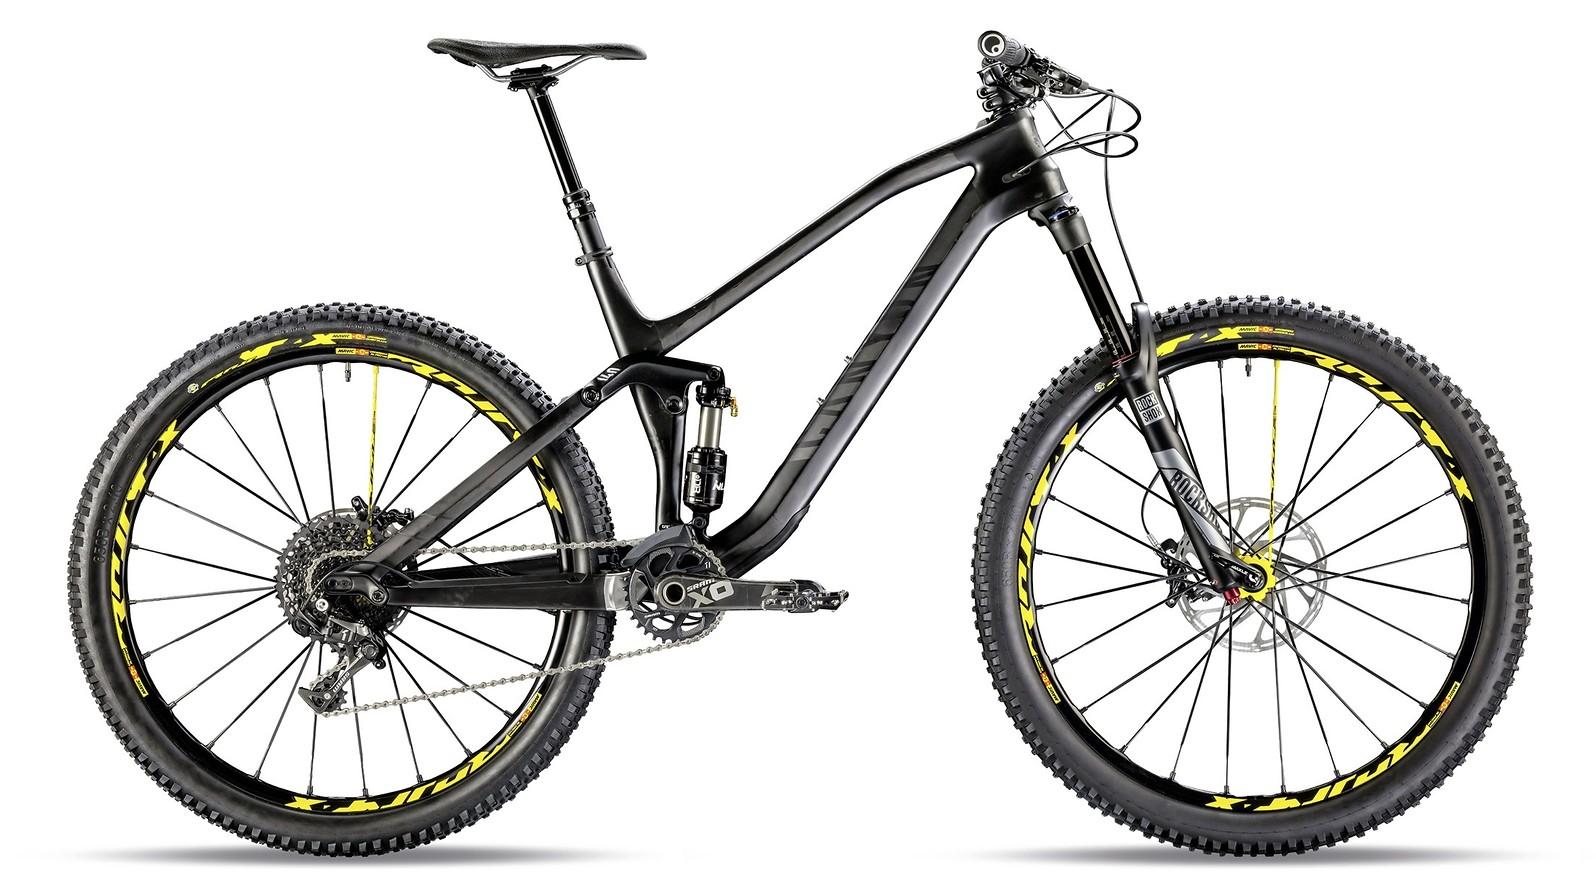 2016 Canyon Spectral CF 9.0 EX  2016 Canyon Spectral CF 9.0 EX Bike